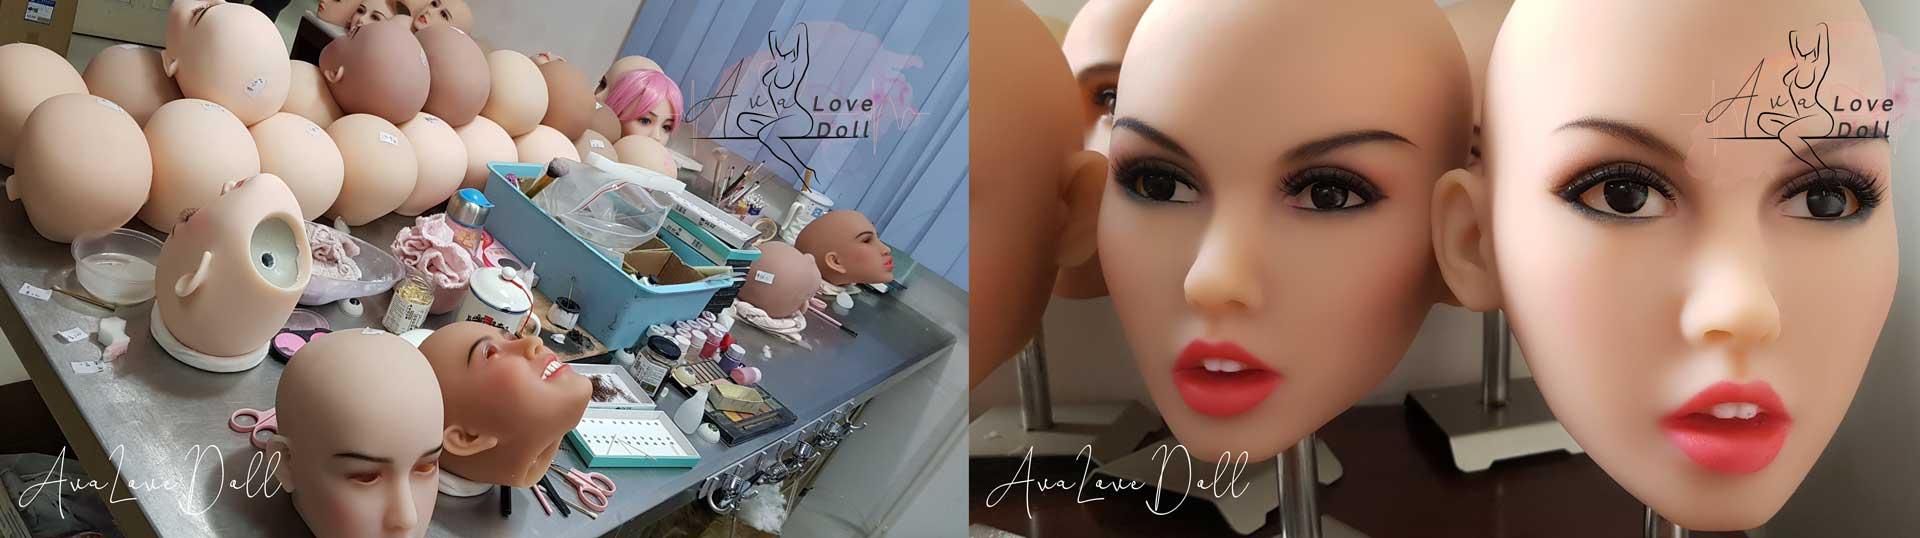 6YE Premium Maquillage Visage Poupée TPE